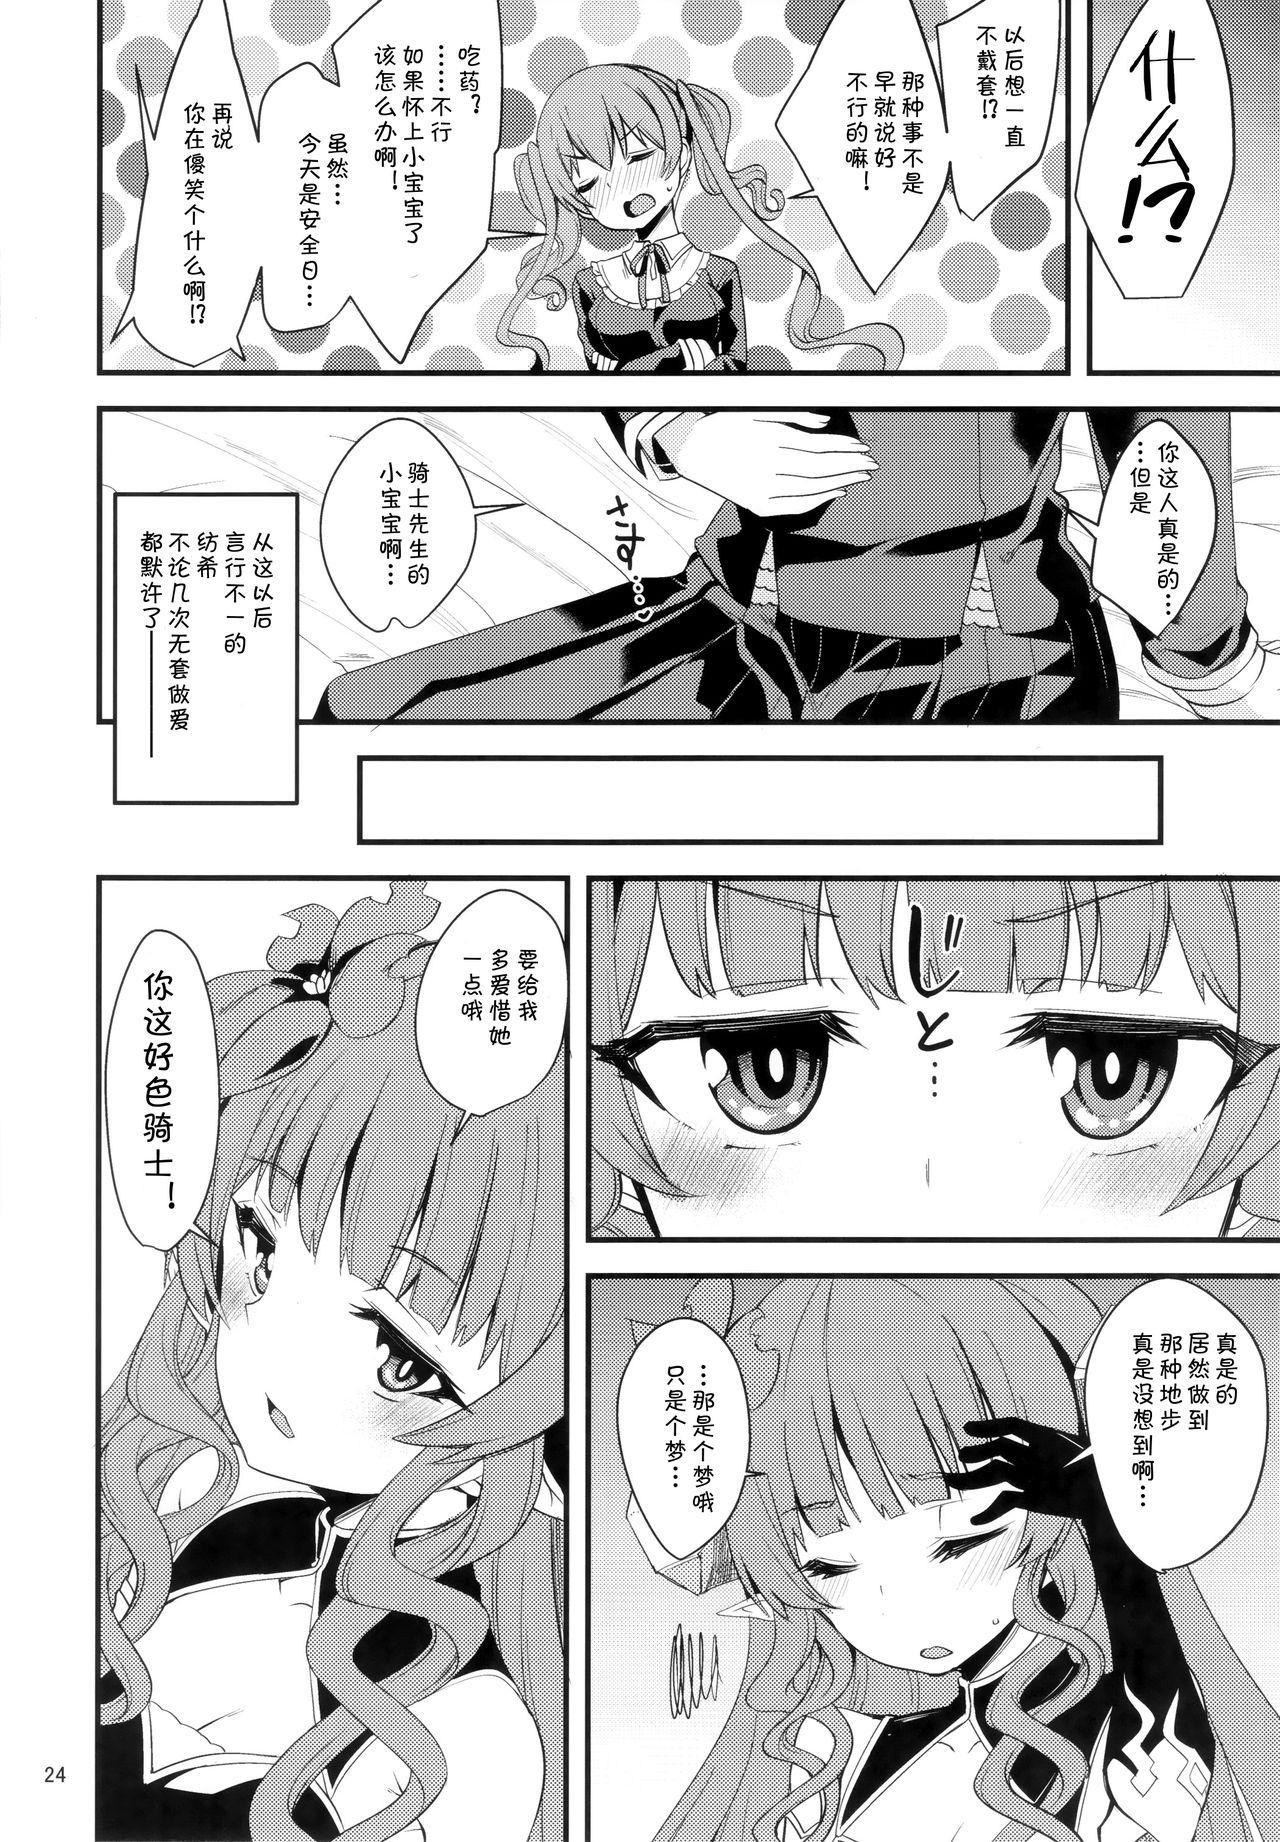 Tsumugi Make Heroine Move!! 03 22